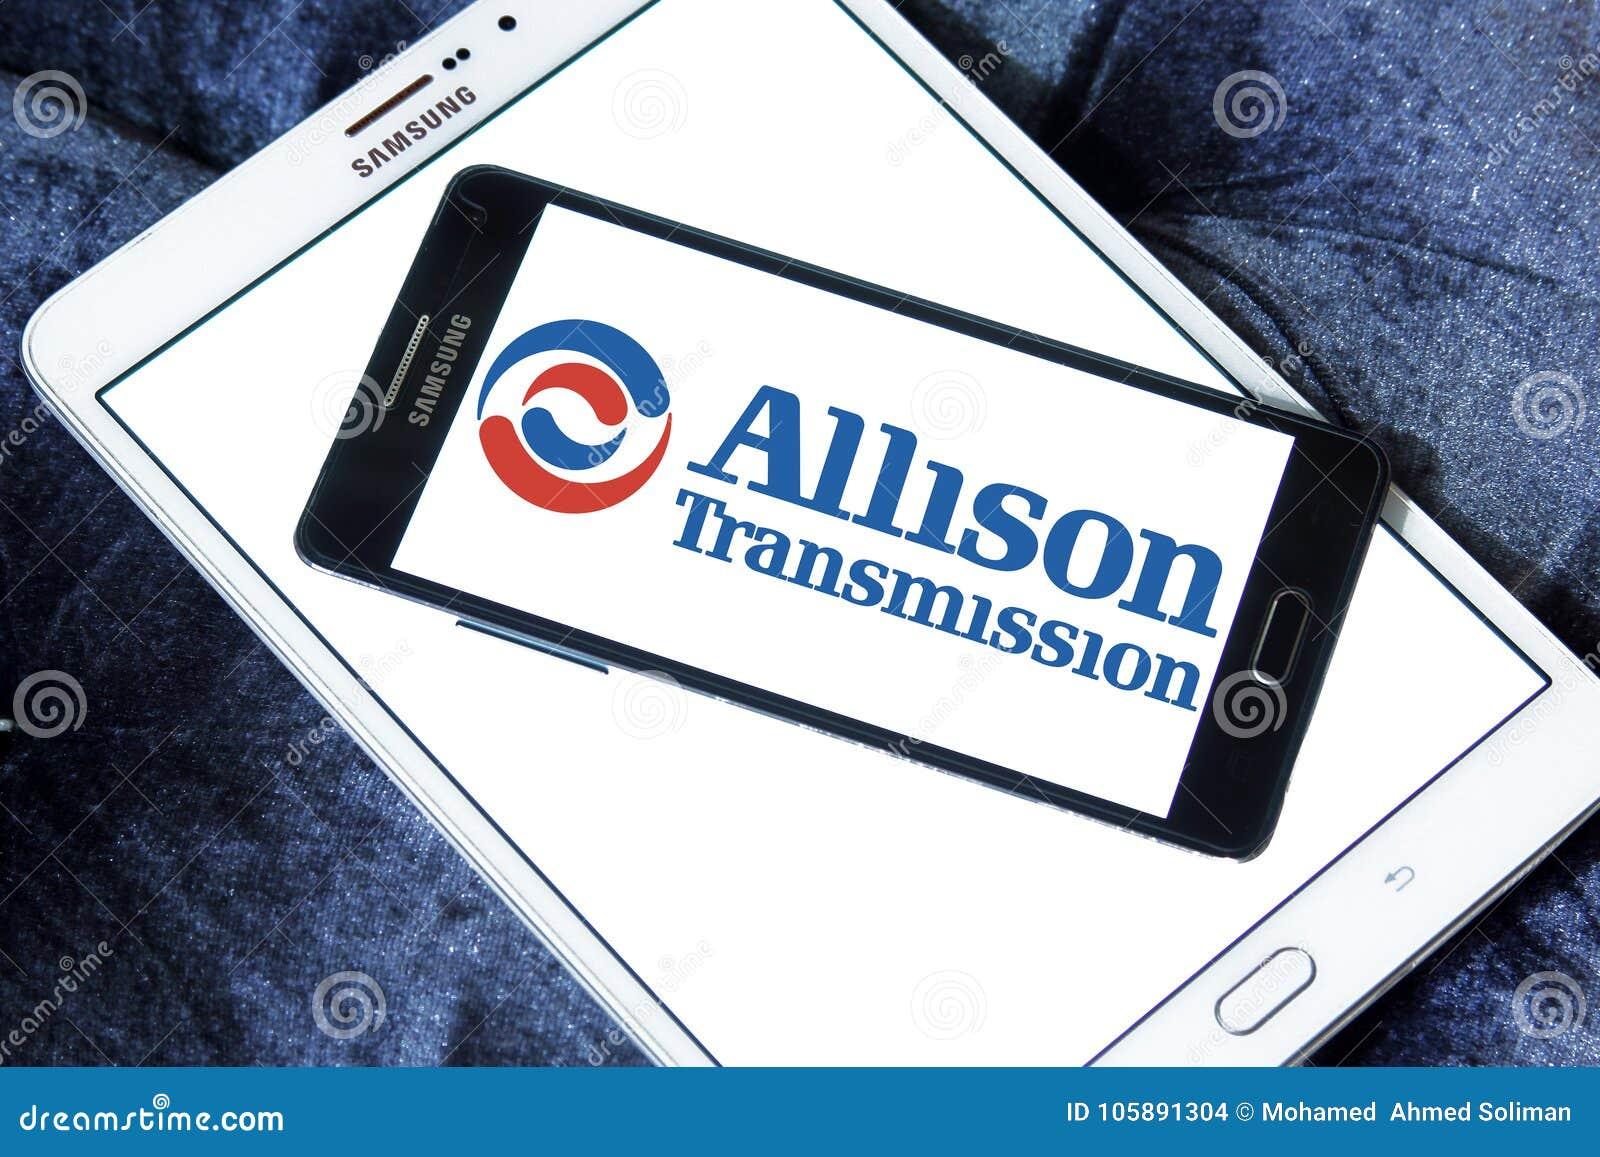 Allison Transmission Logo Editorial Stock Image Image Of Applications 105891304